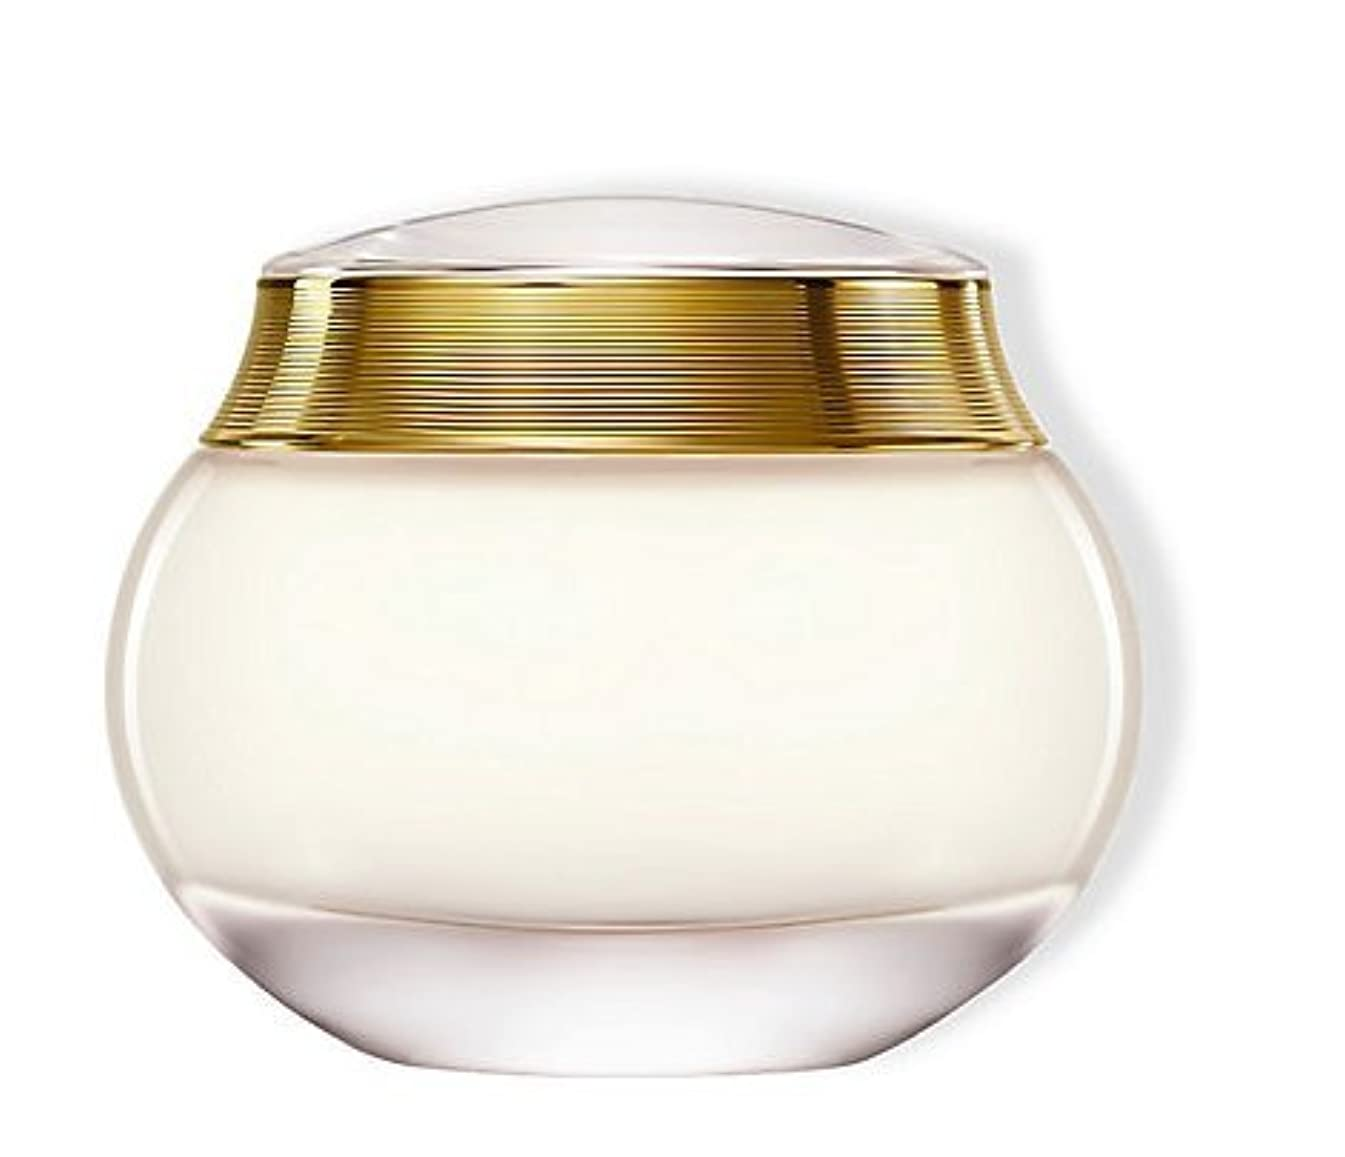 【Dior(ディオール)】【国内正規品】ジャドール ボディ クリーム_ 150mL/クリーム